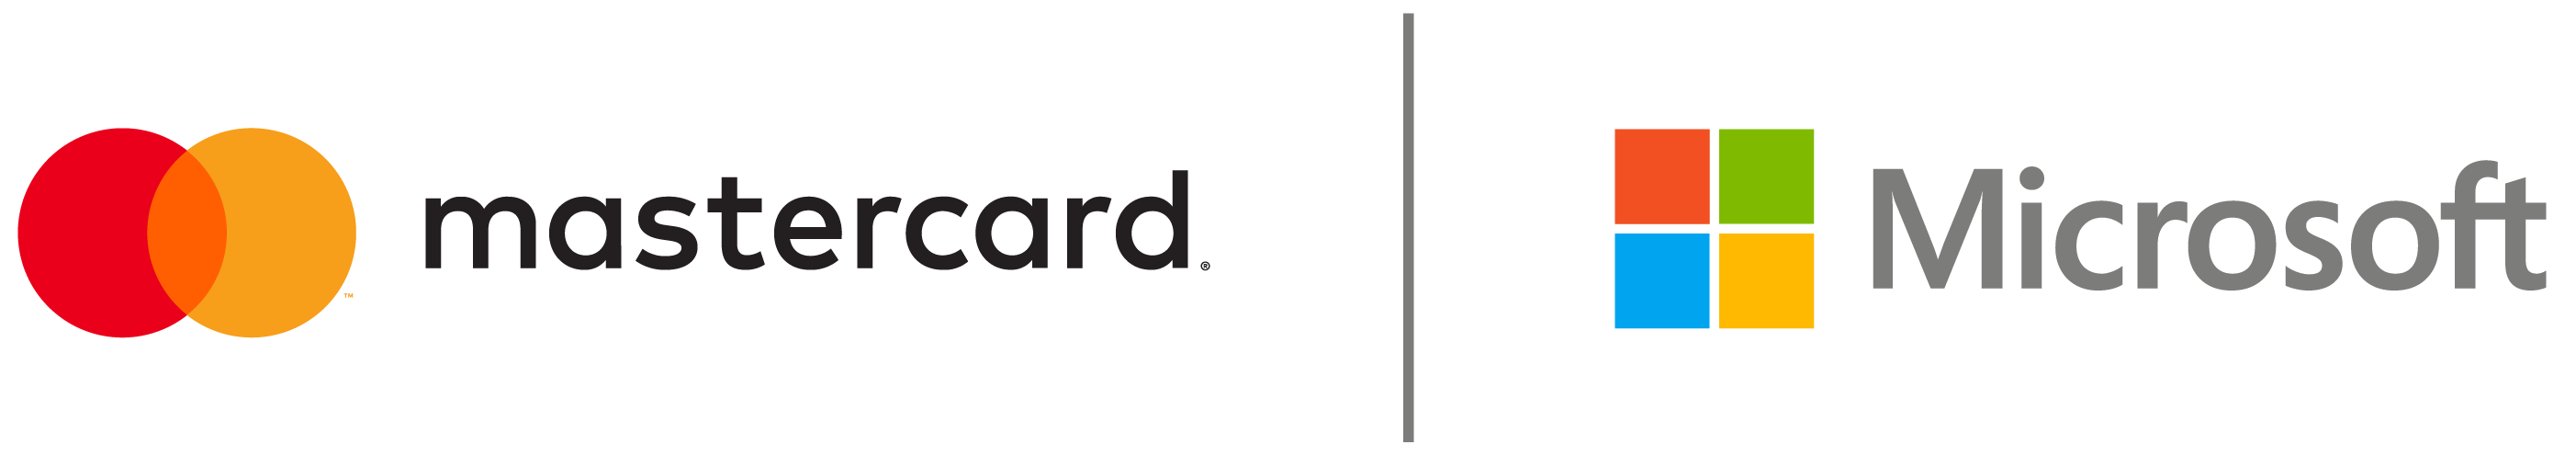 https://www.macfreak.nl/modules/news/images/zArt.Mastercard-and-Microsoft.png